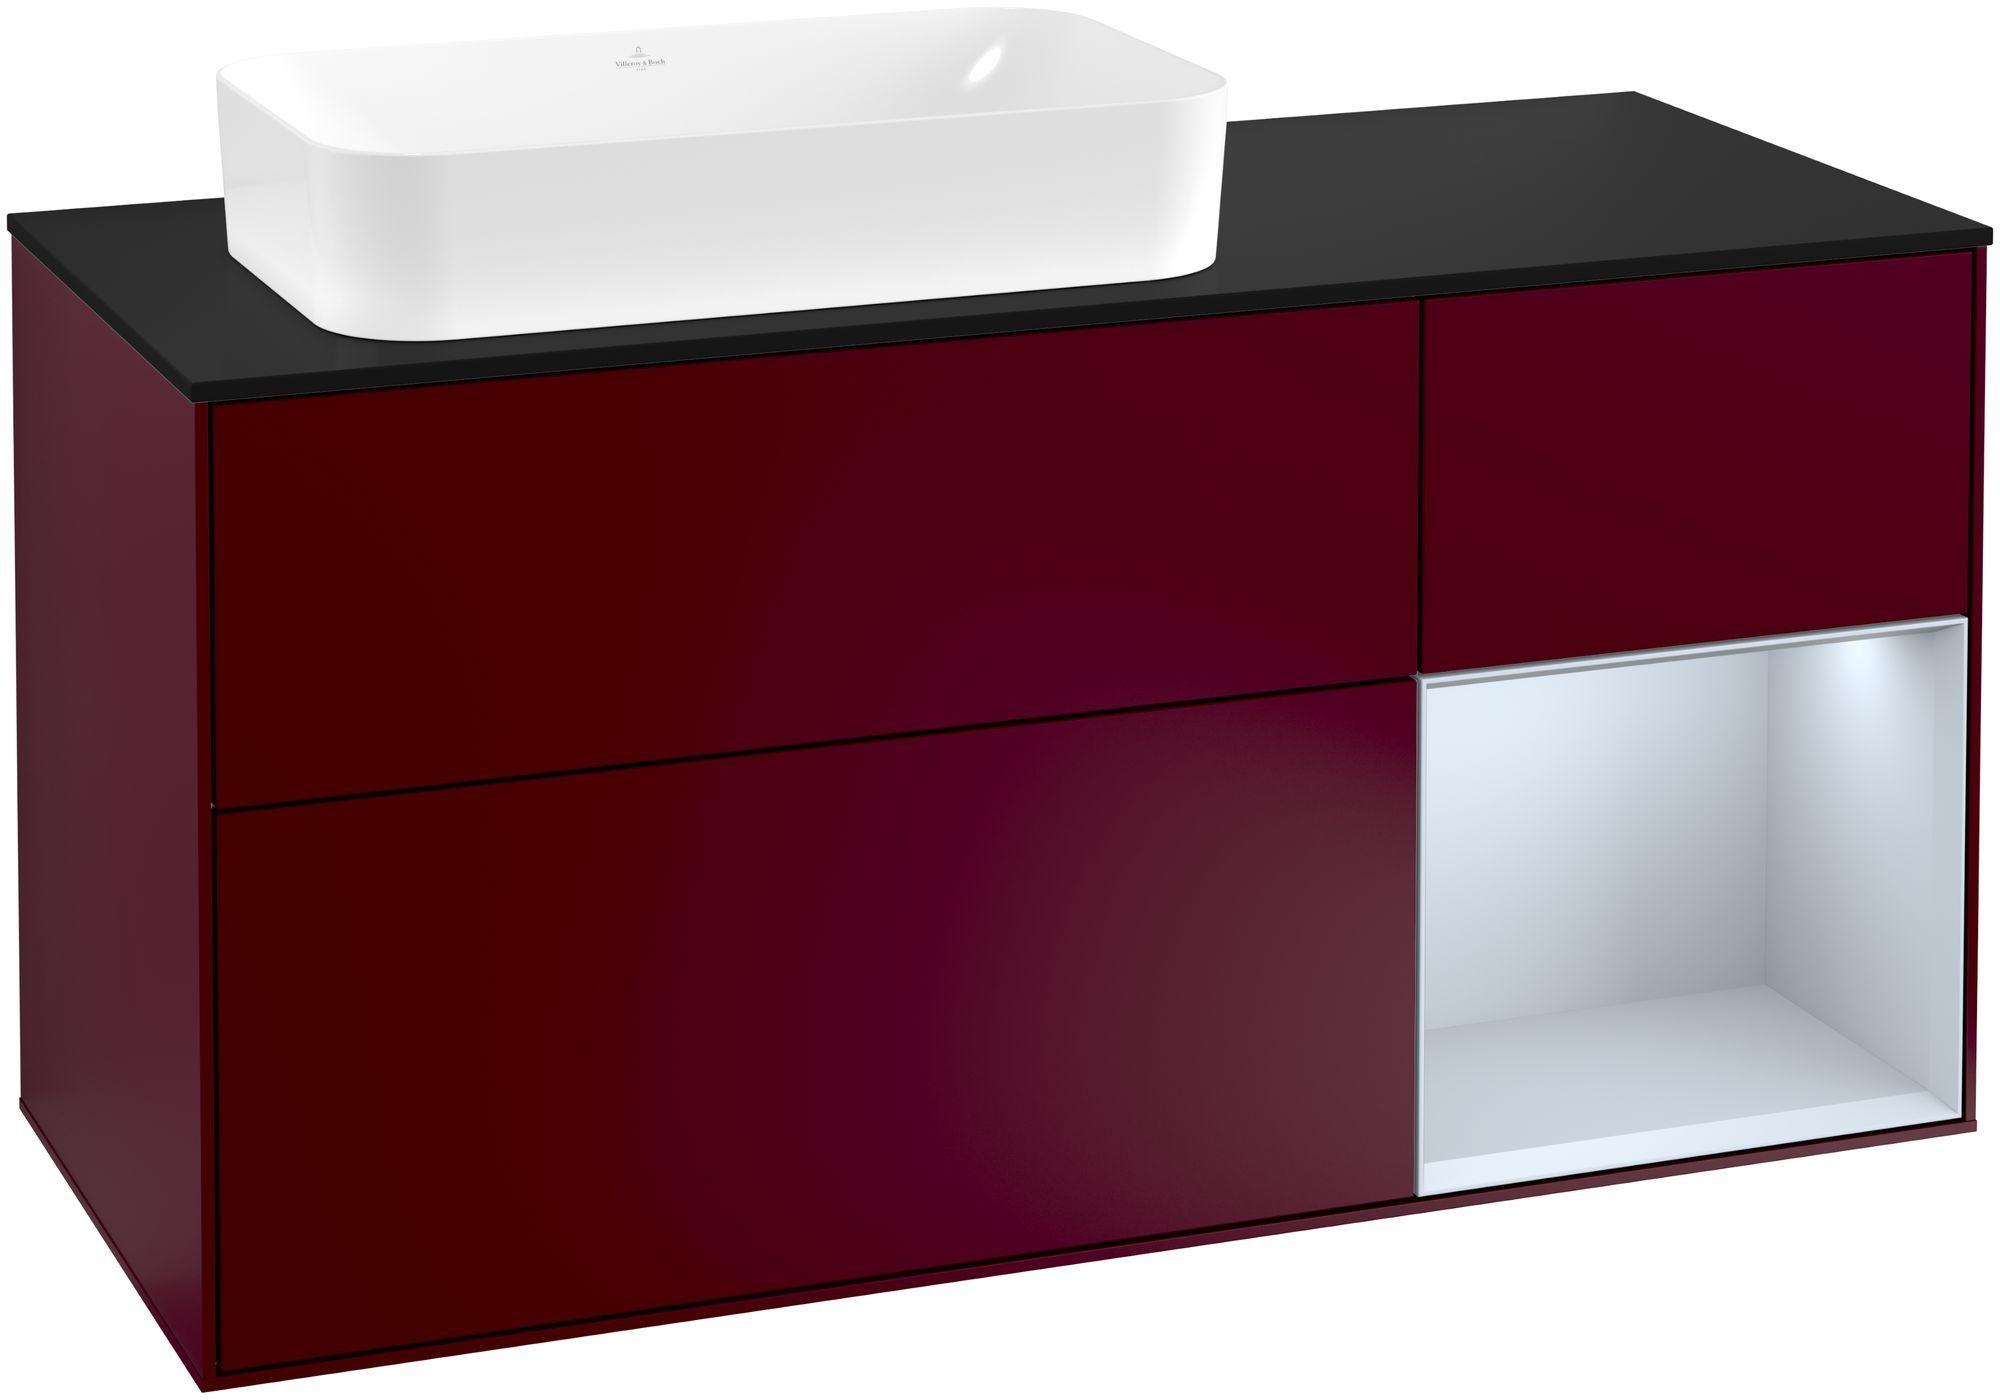 Villeroy & Boch Finion F28 Waschtischunterschrank mit Regalelement 3 Auszüge Waschtisch links LED-Beleuchtung B:120xH:60,3xT:50,1cm Front, Korpus: Peony, Regal: Cloud, Glasplatte: Black Matt F282HAHB